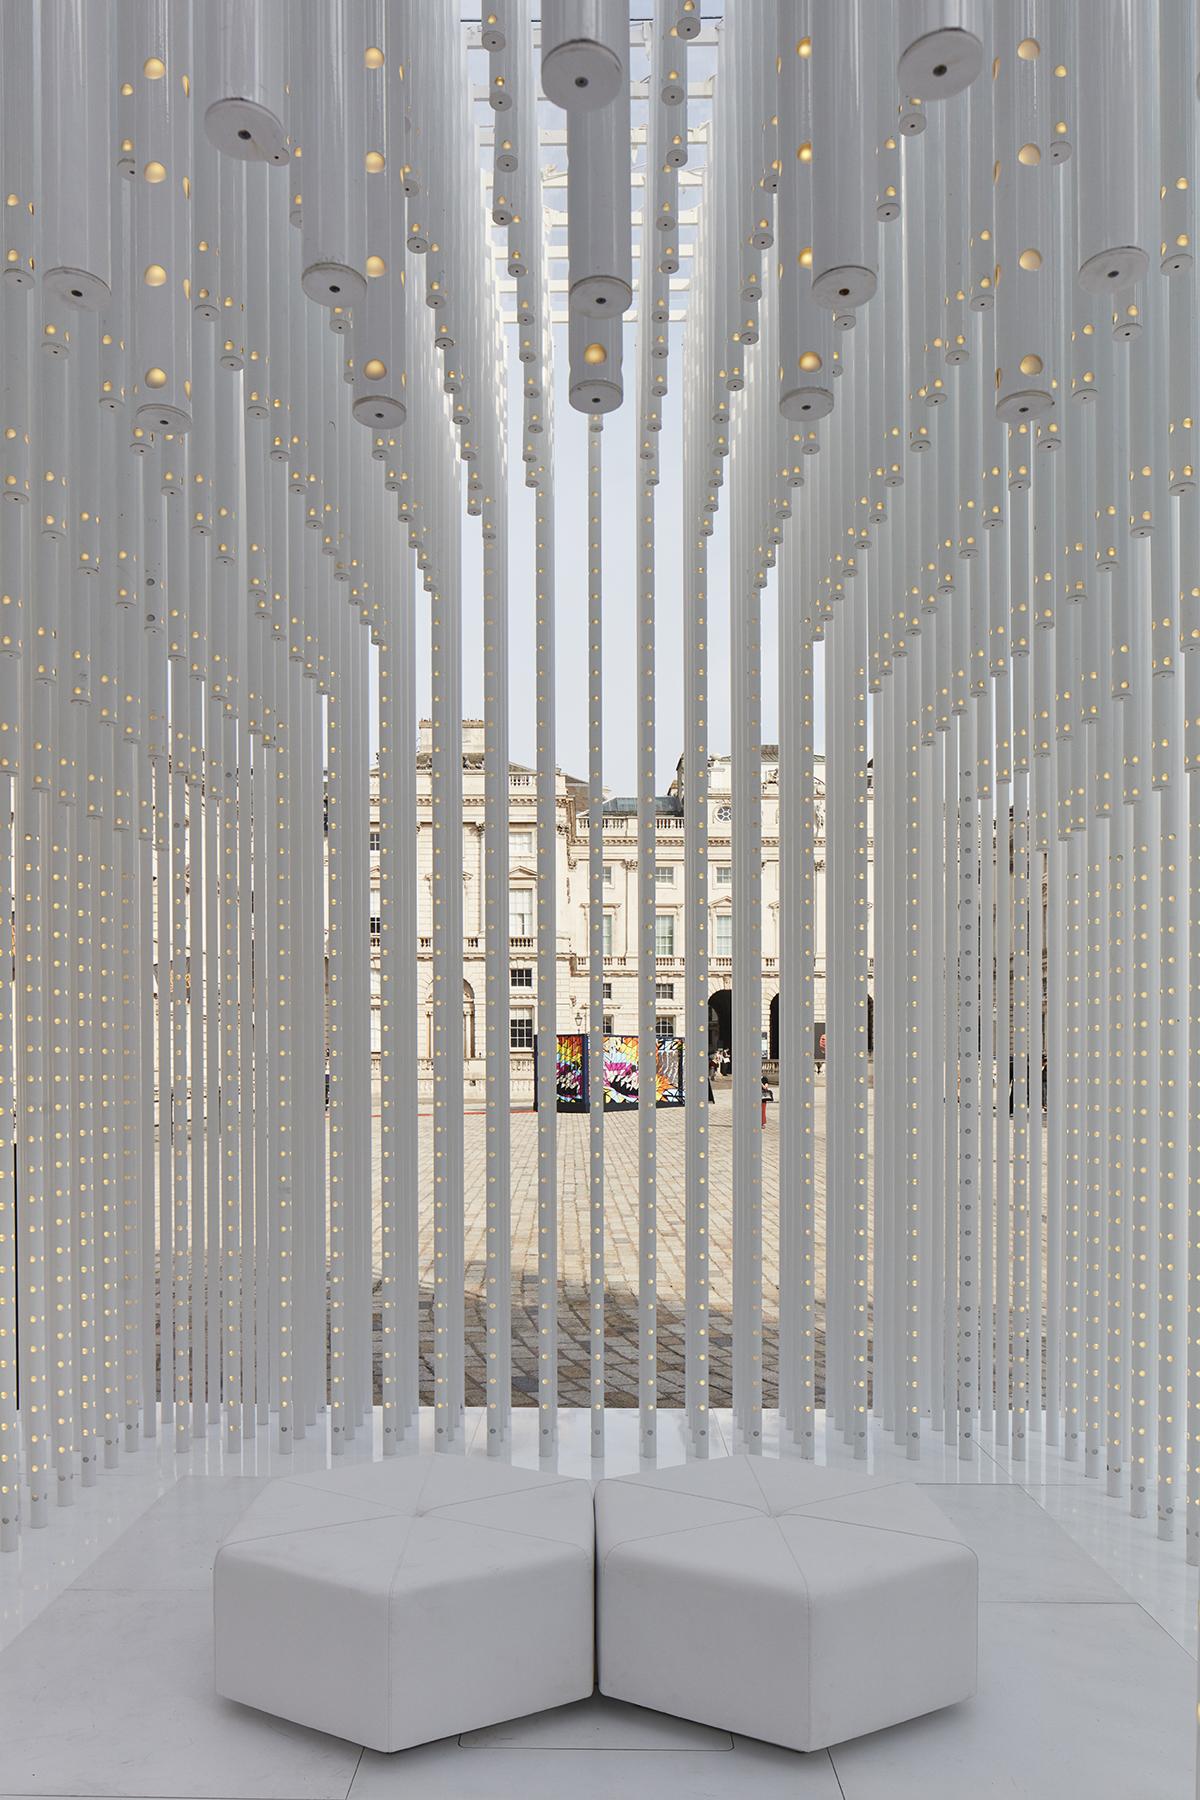 HousEmotion è l'installazione di Tabanlıoğlu Architects